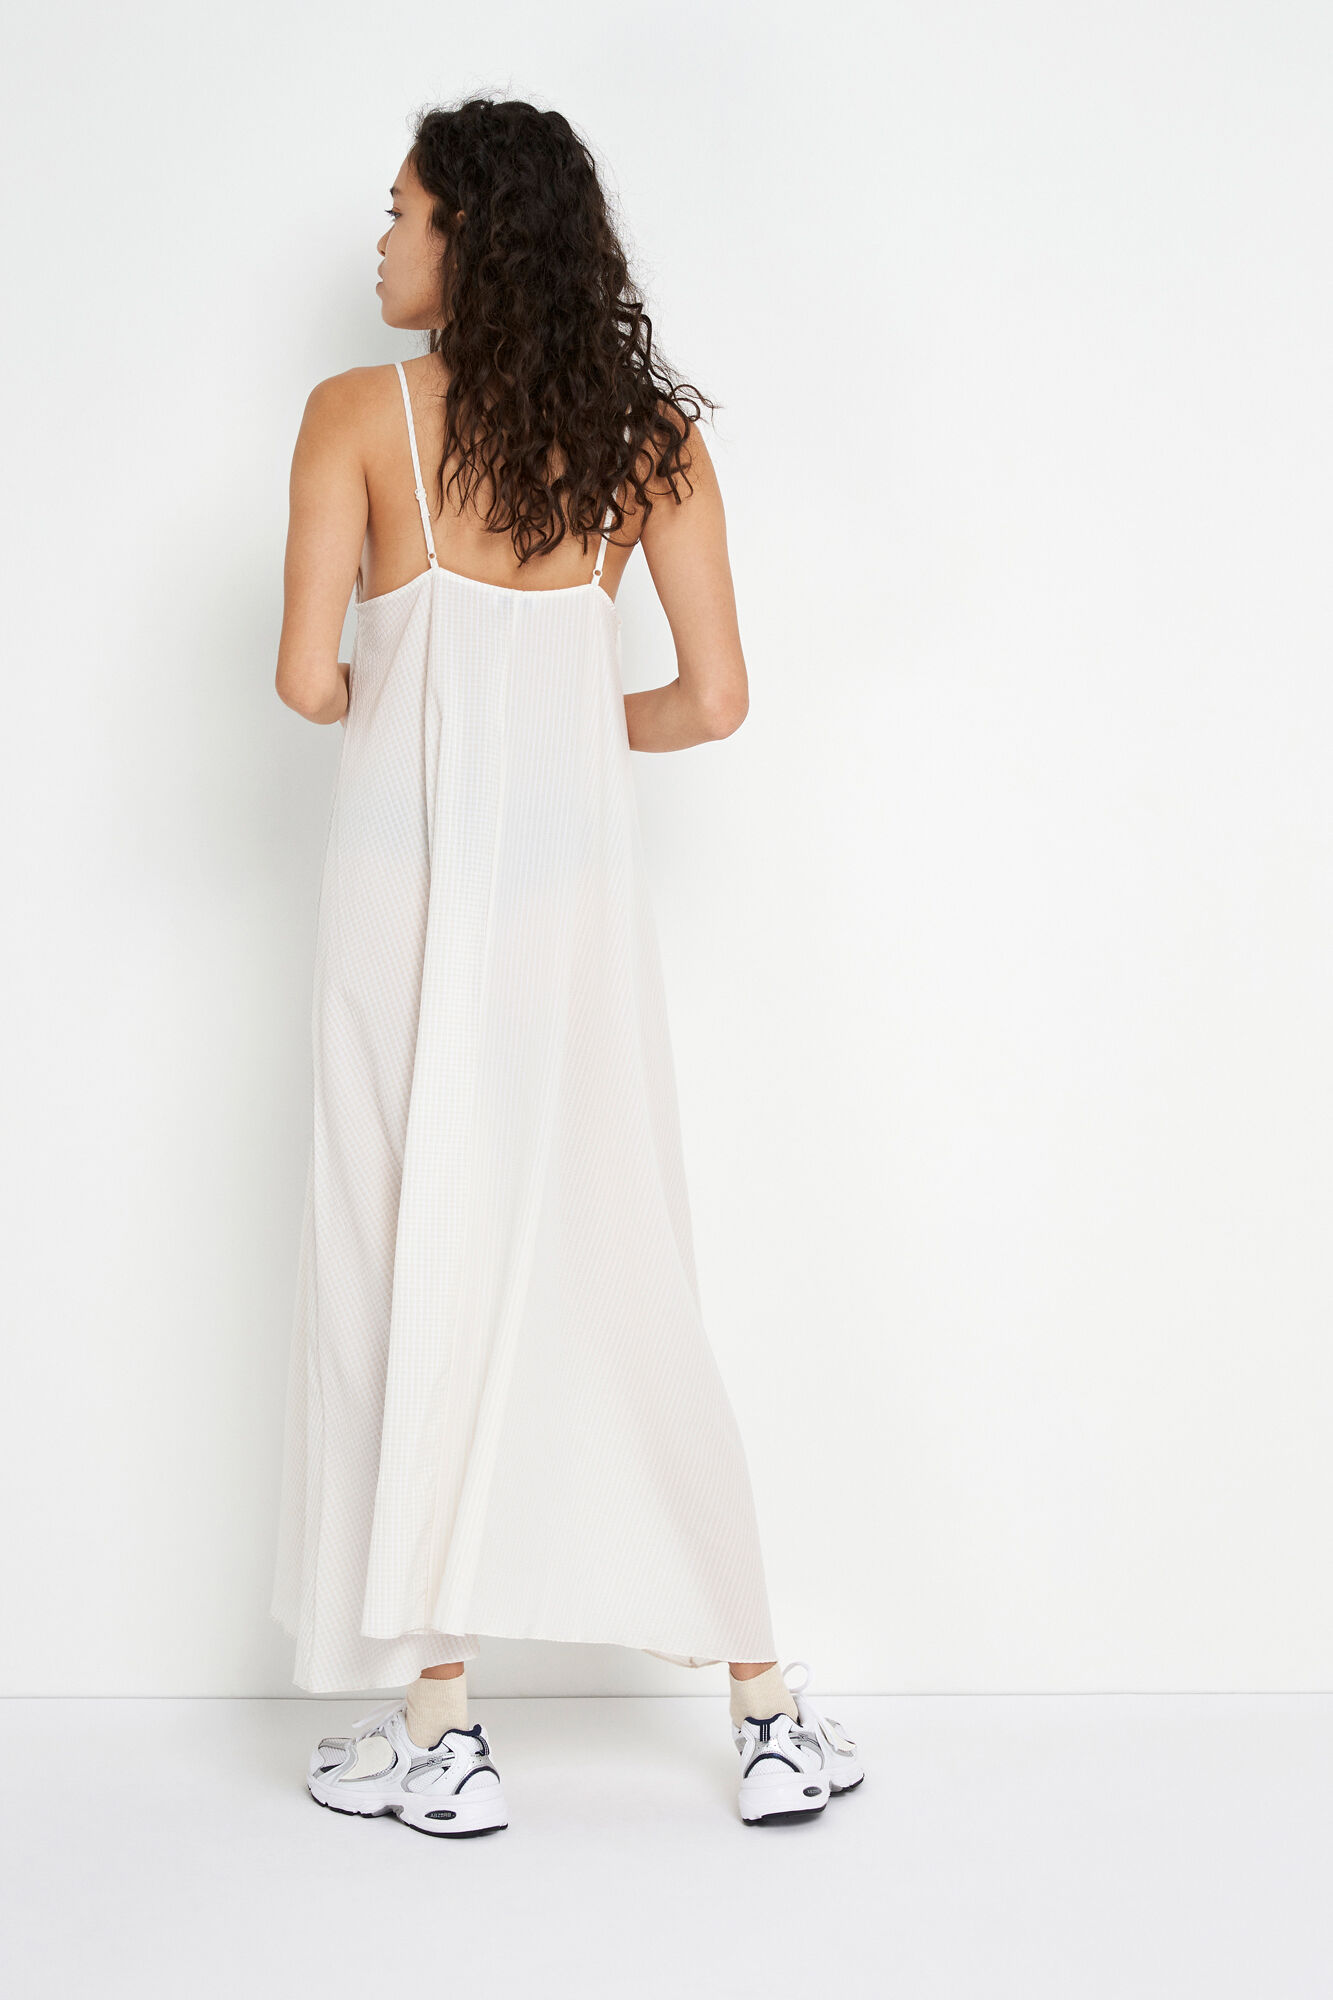 ENSYLPHIDE SL DRESS 6739, SUMMER MIX